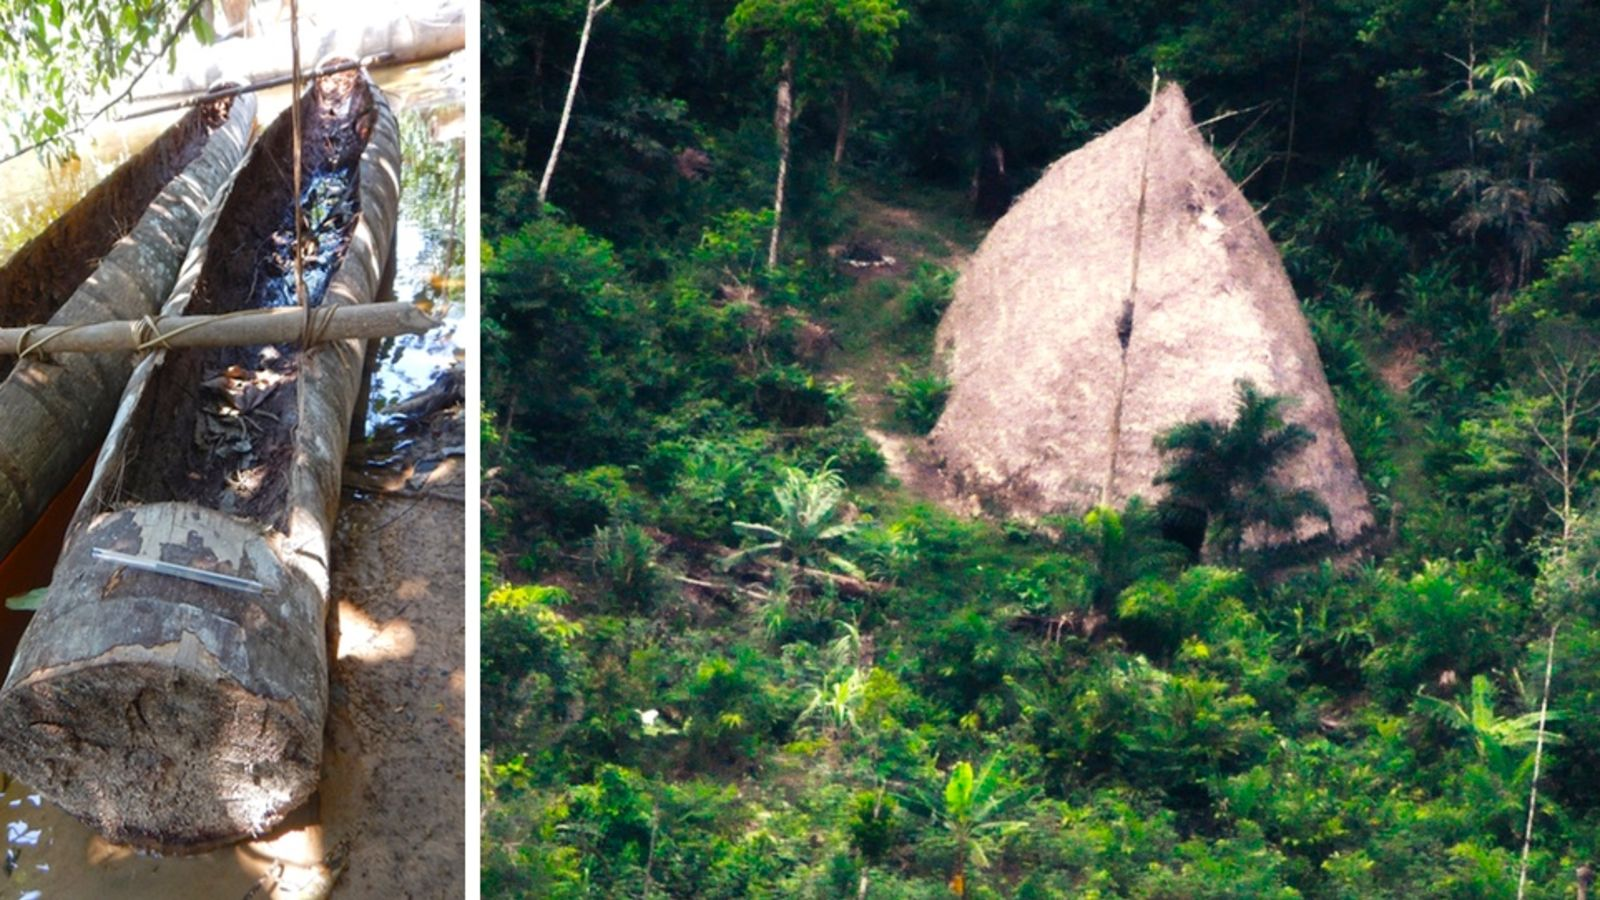 drone films Amazon tribe